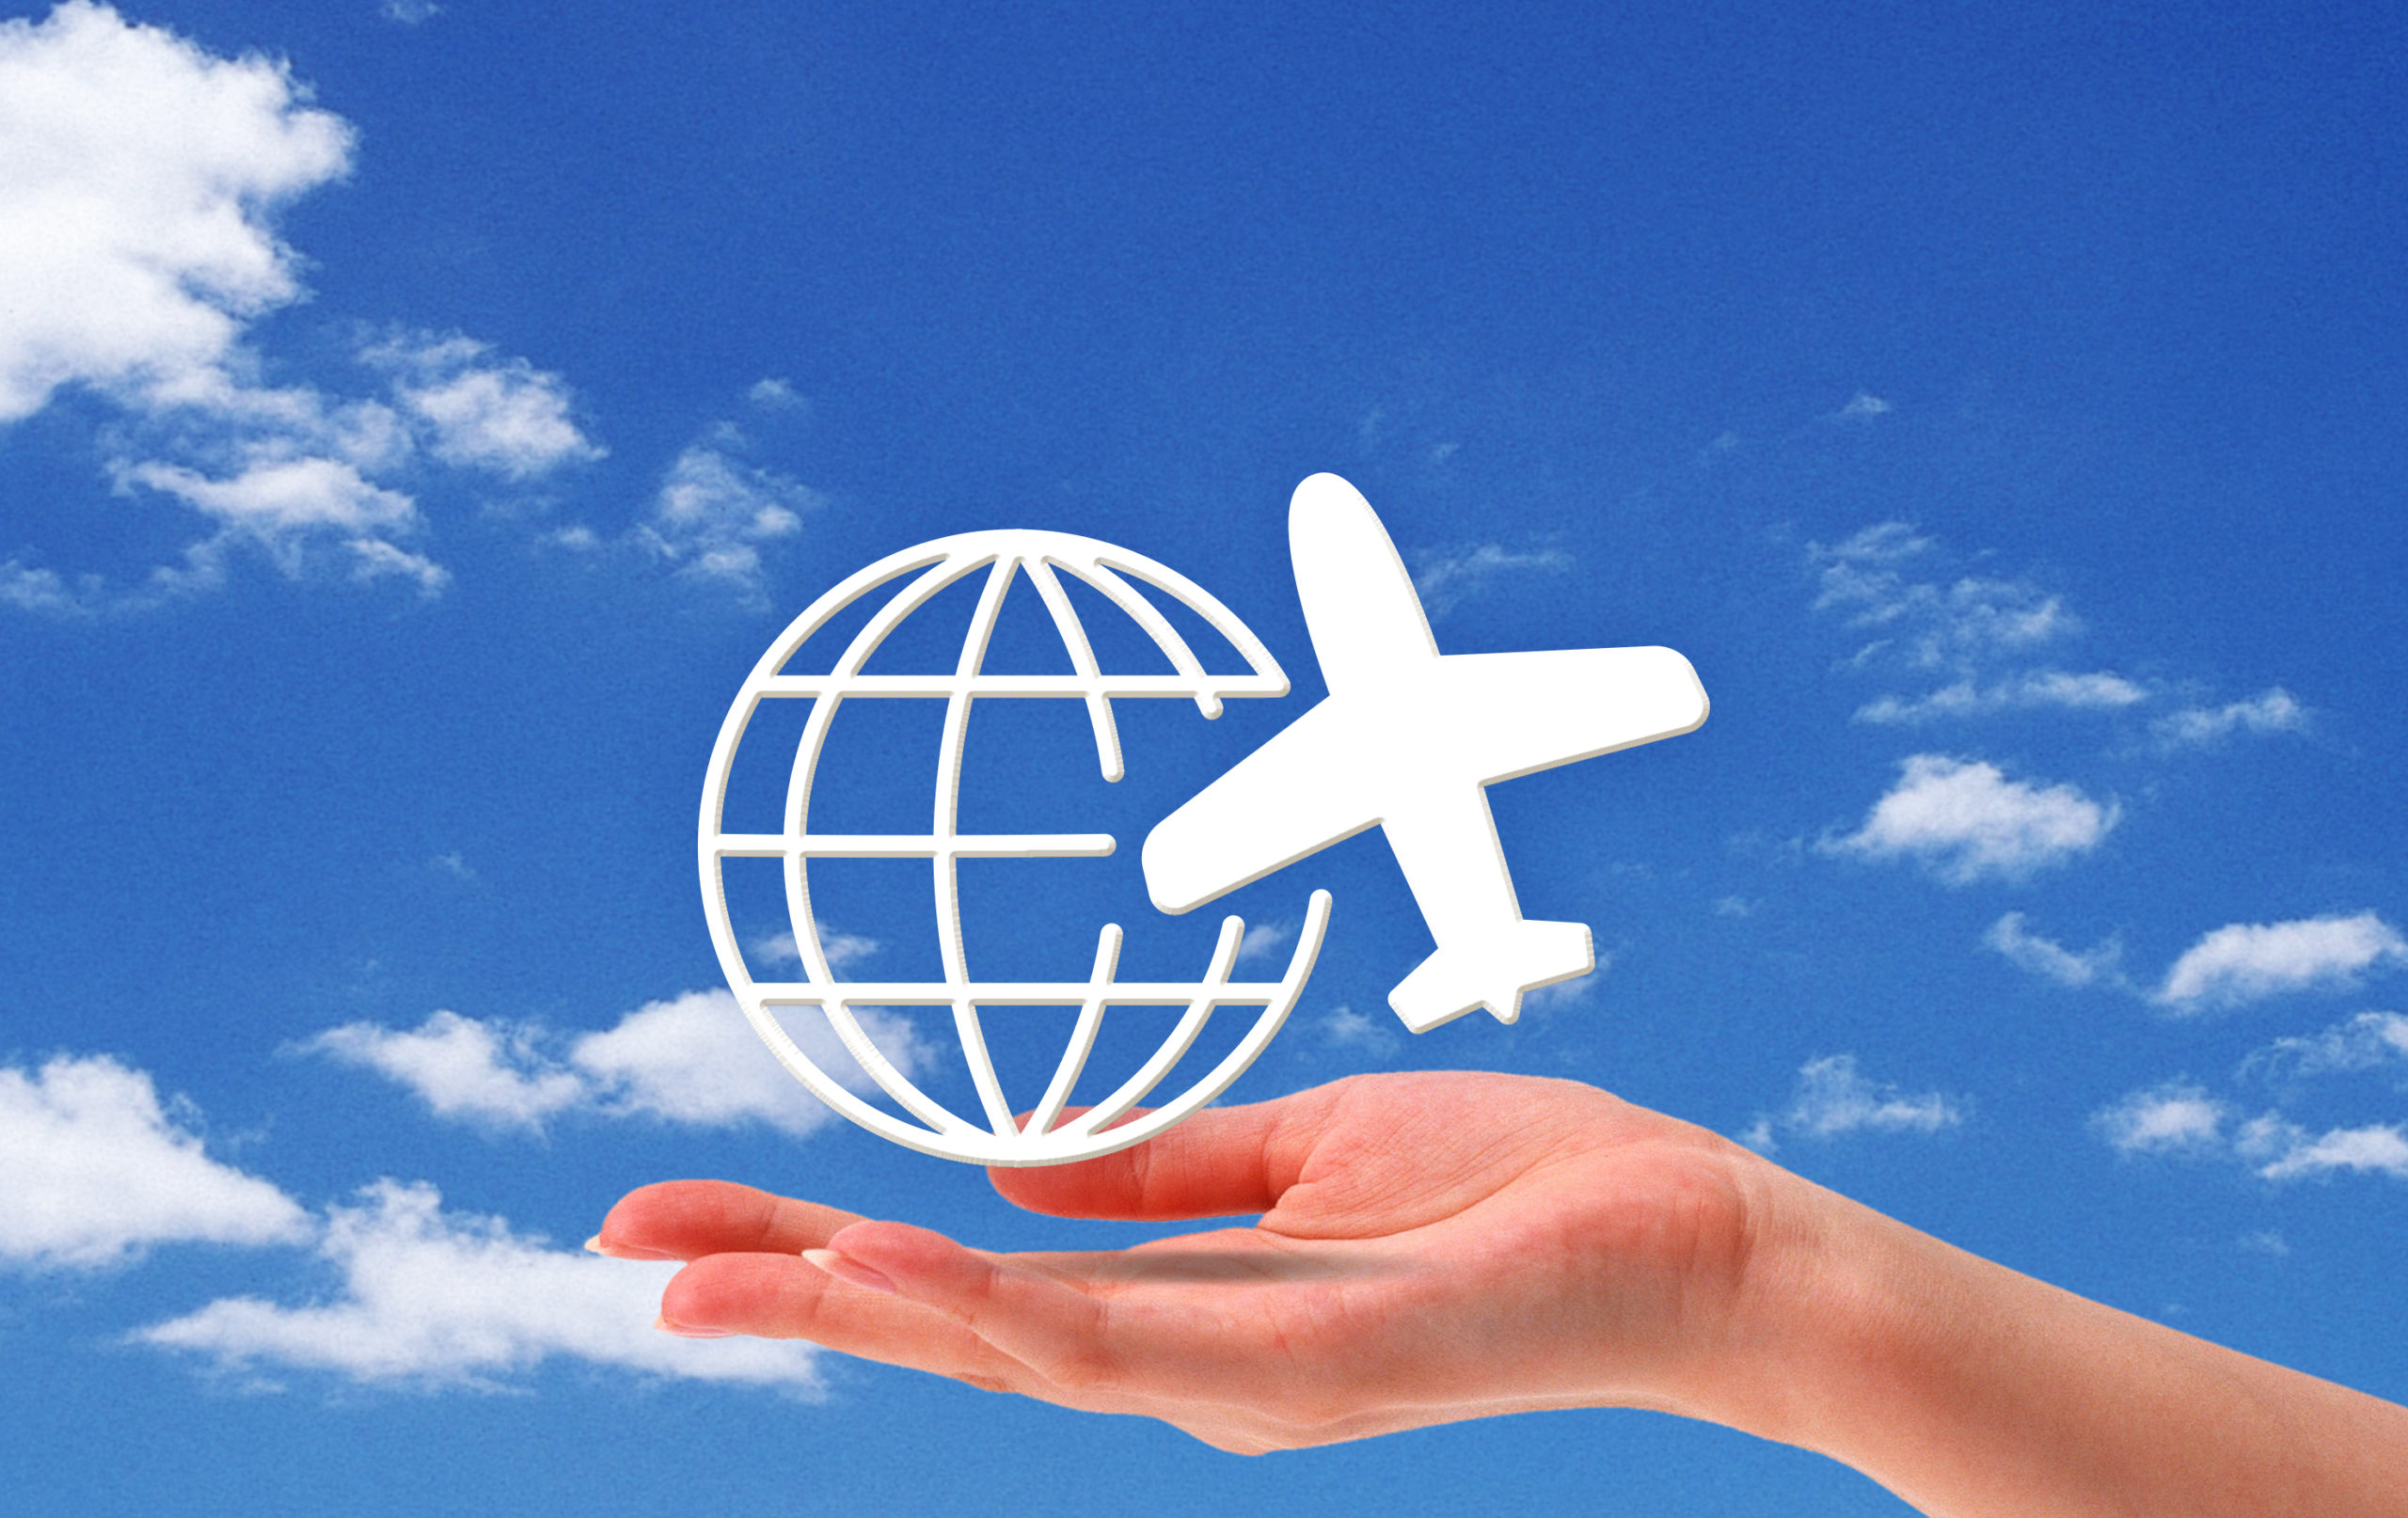 社員旅行や団体旅行の手配